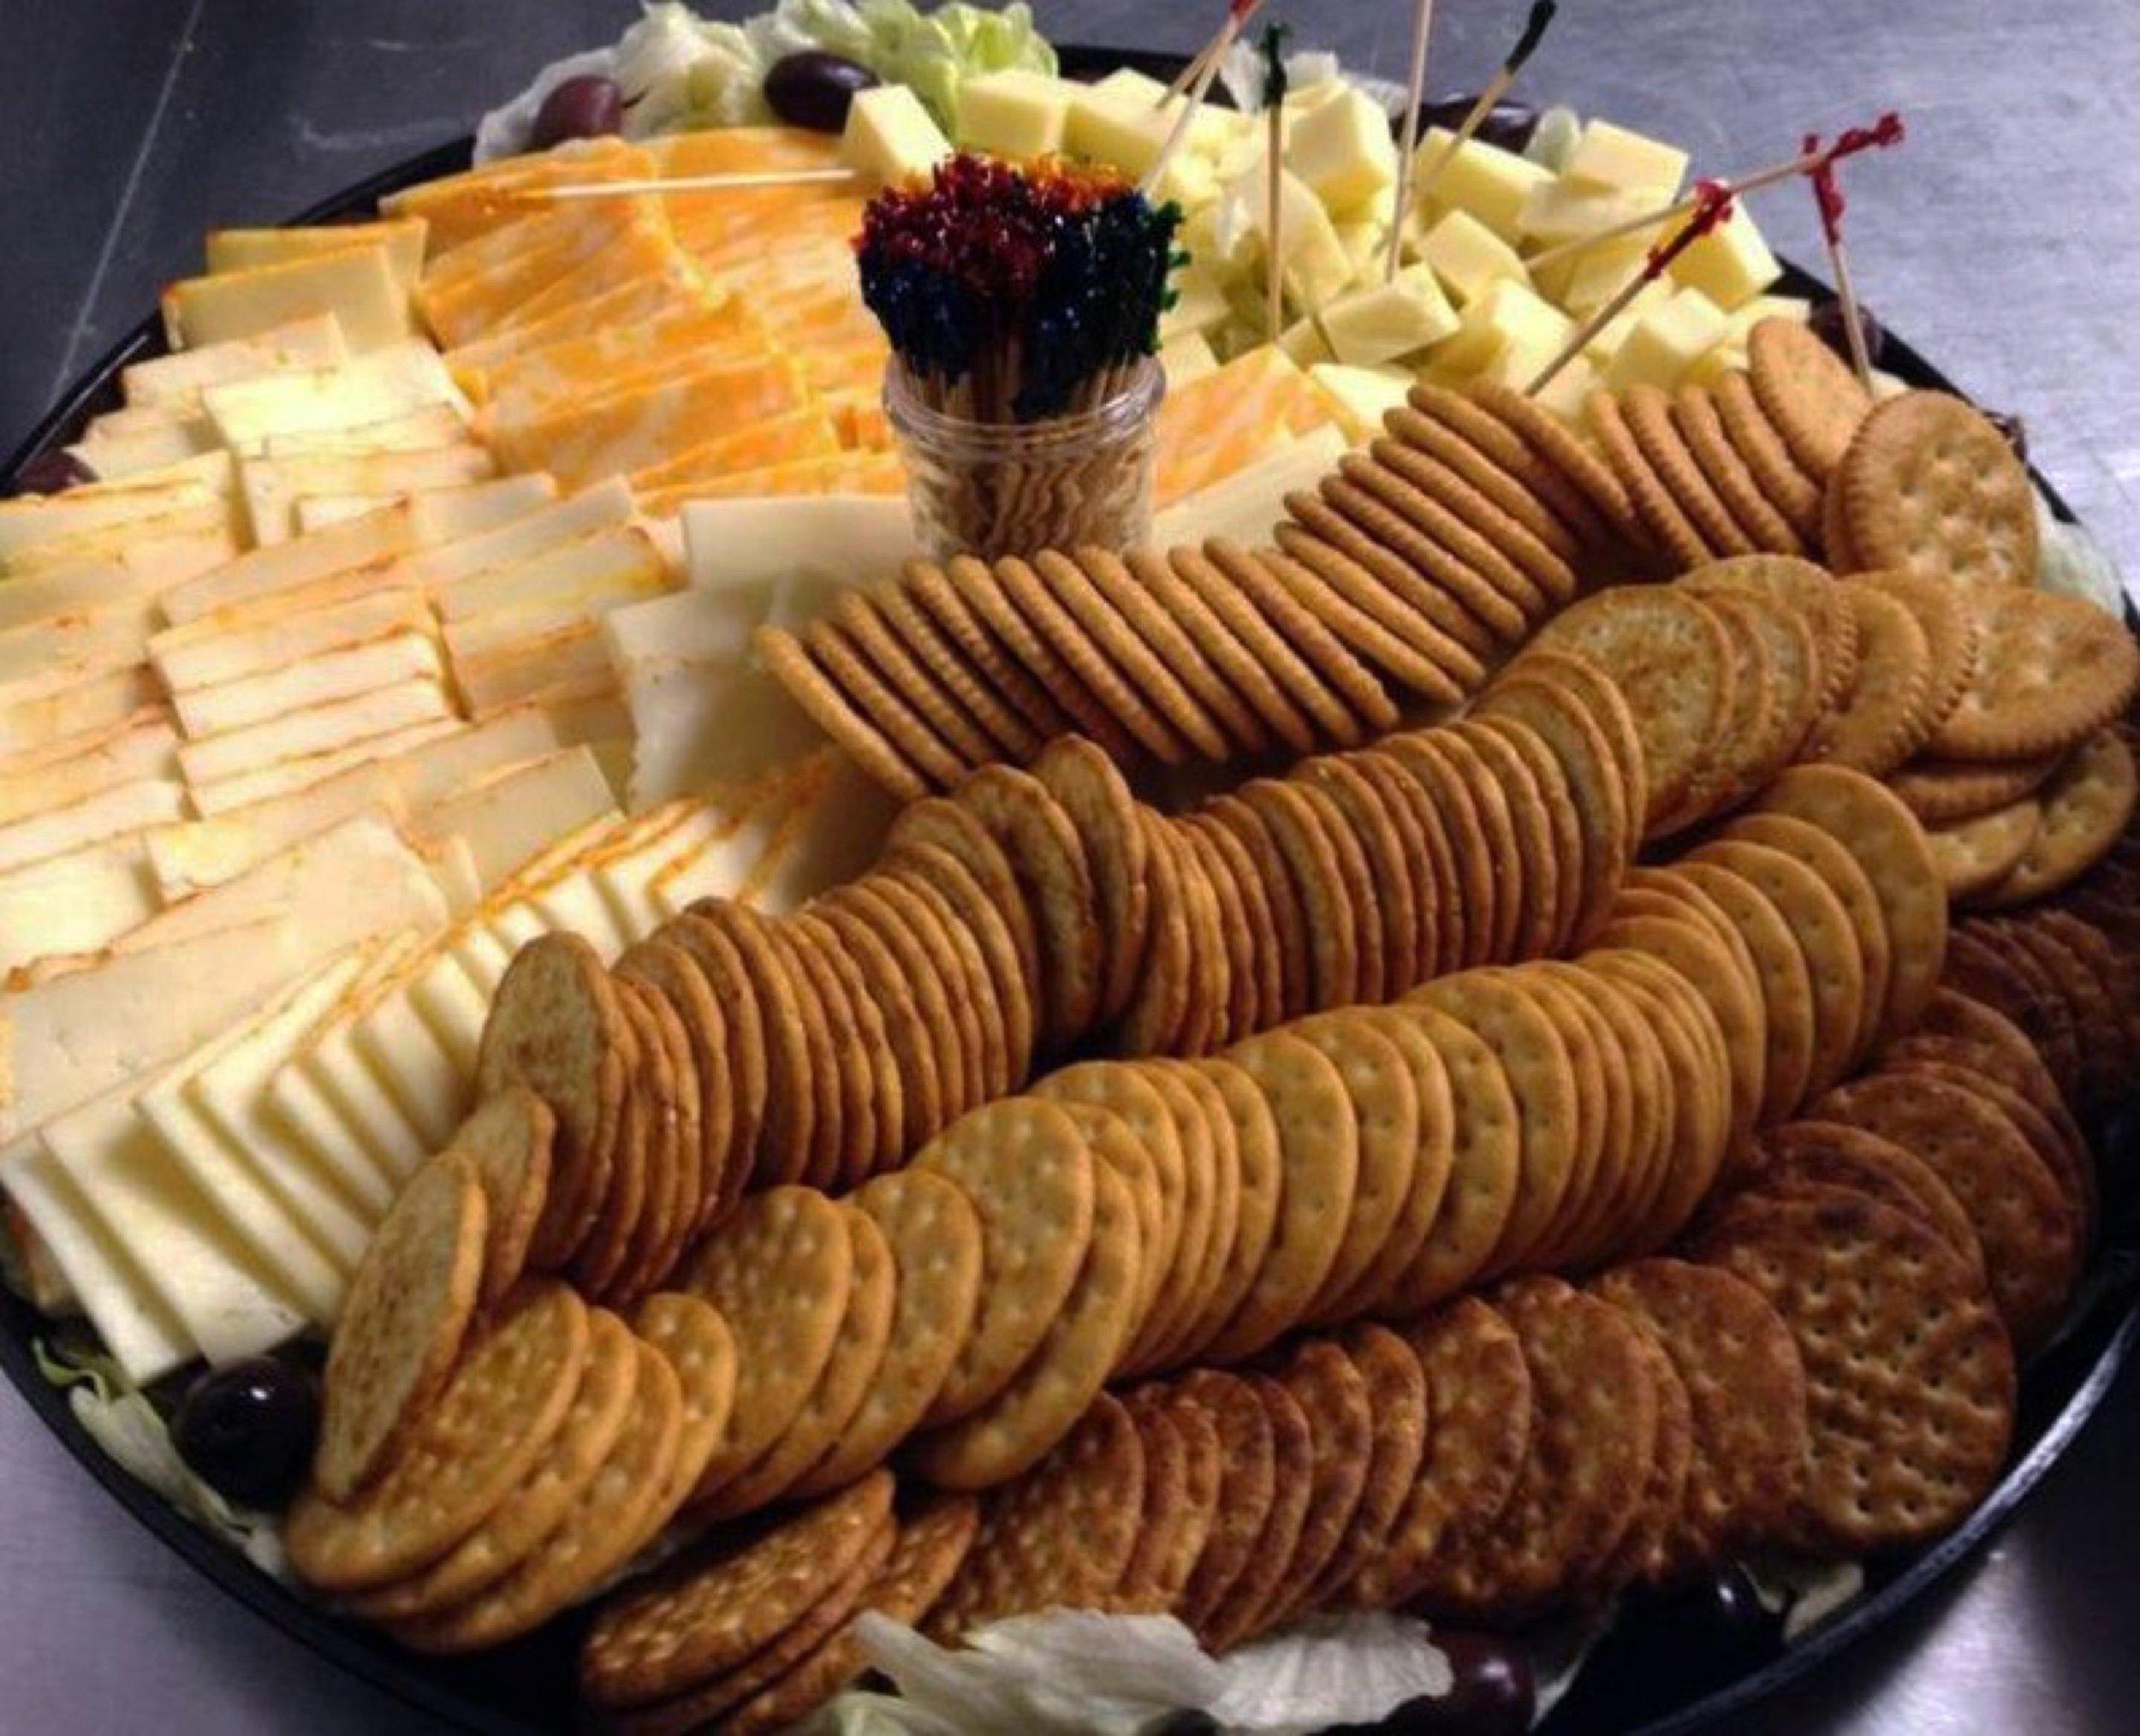 royal-roast-beef-cheese-and-crackers-platter.jpg